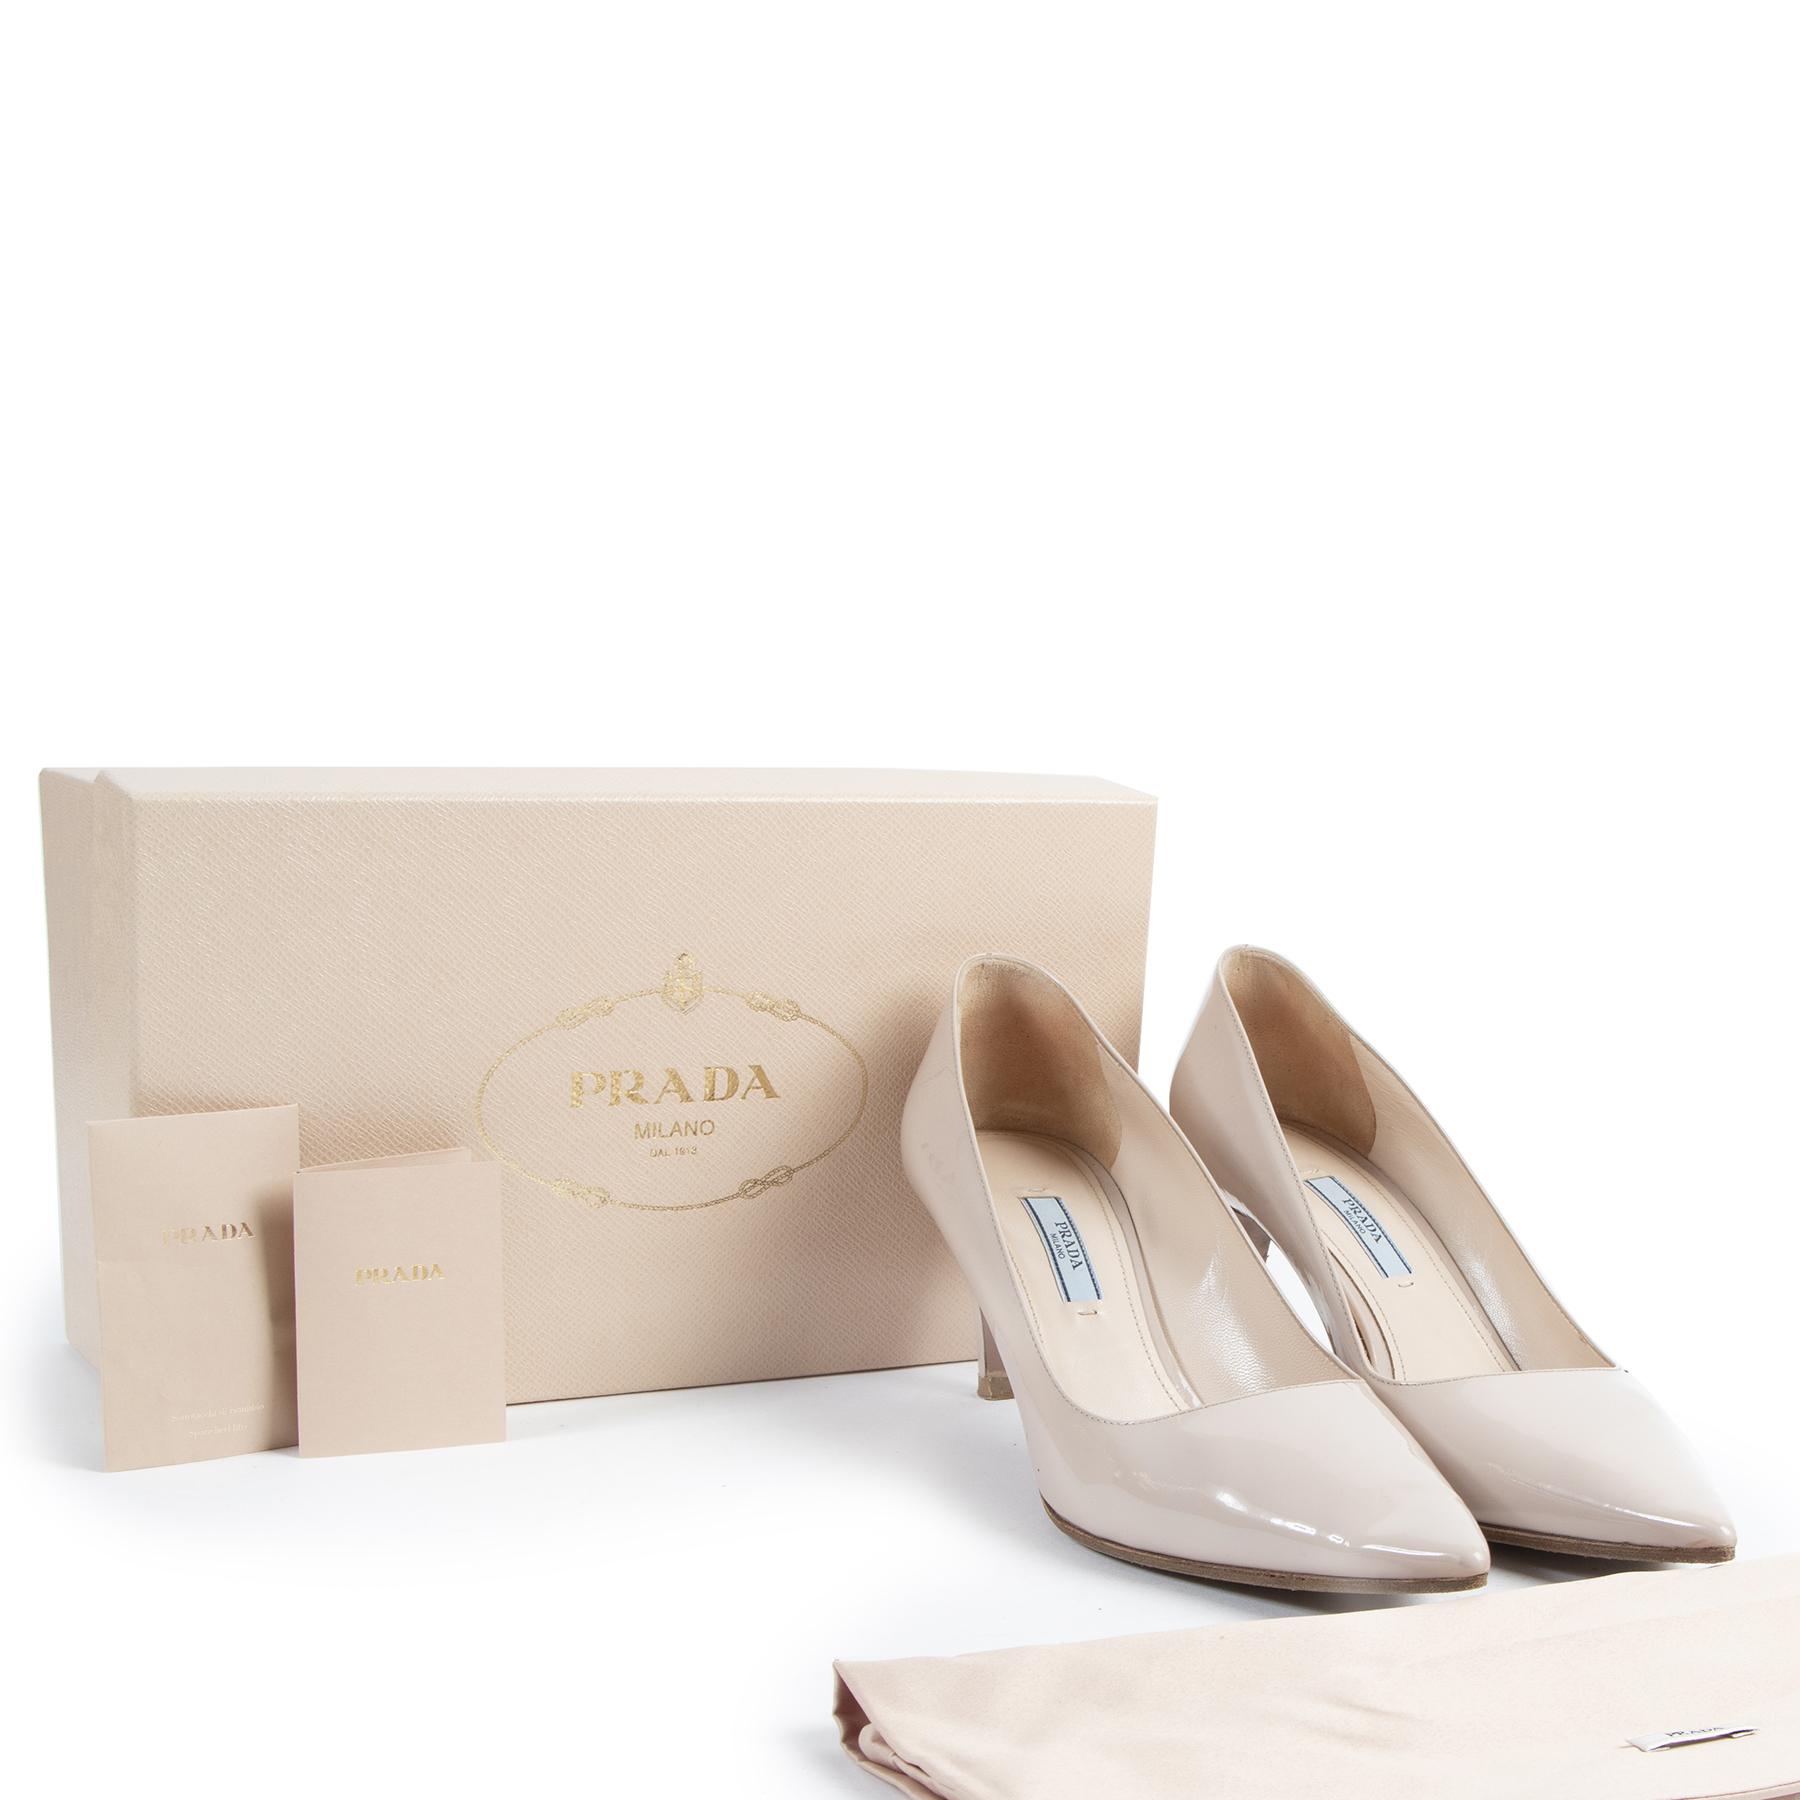 Authentic secondhand Prada Nude Patent Leather Pumps - Size 40,5 designer shoes fashion luxury vintage webshop safe secure online shopping